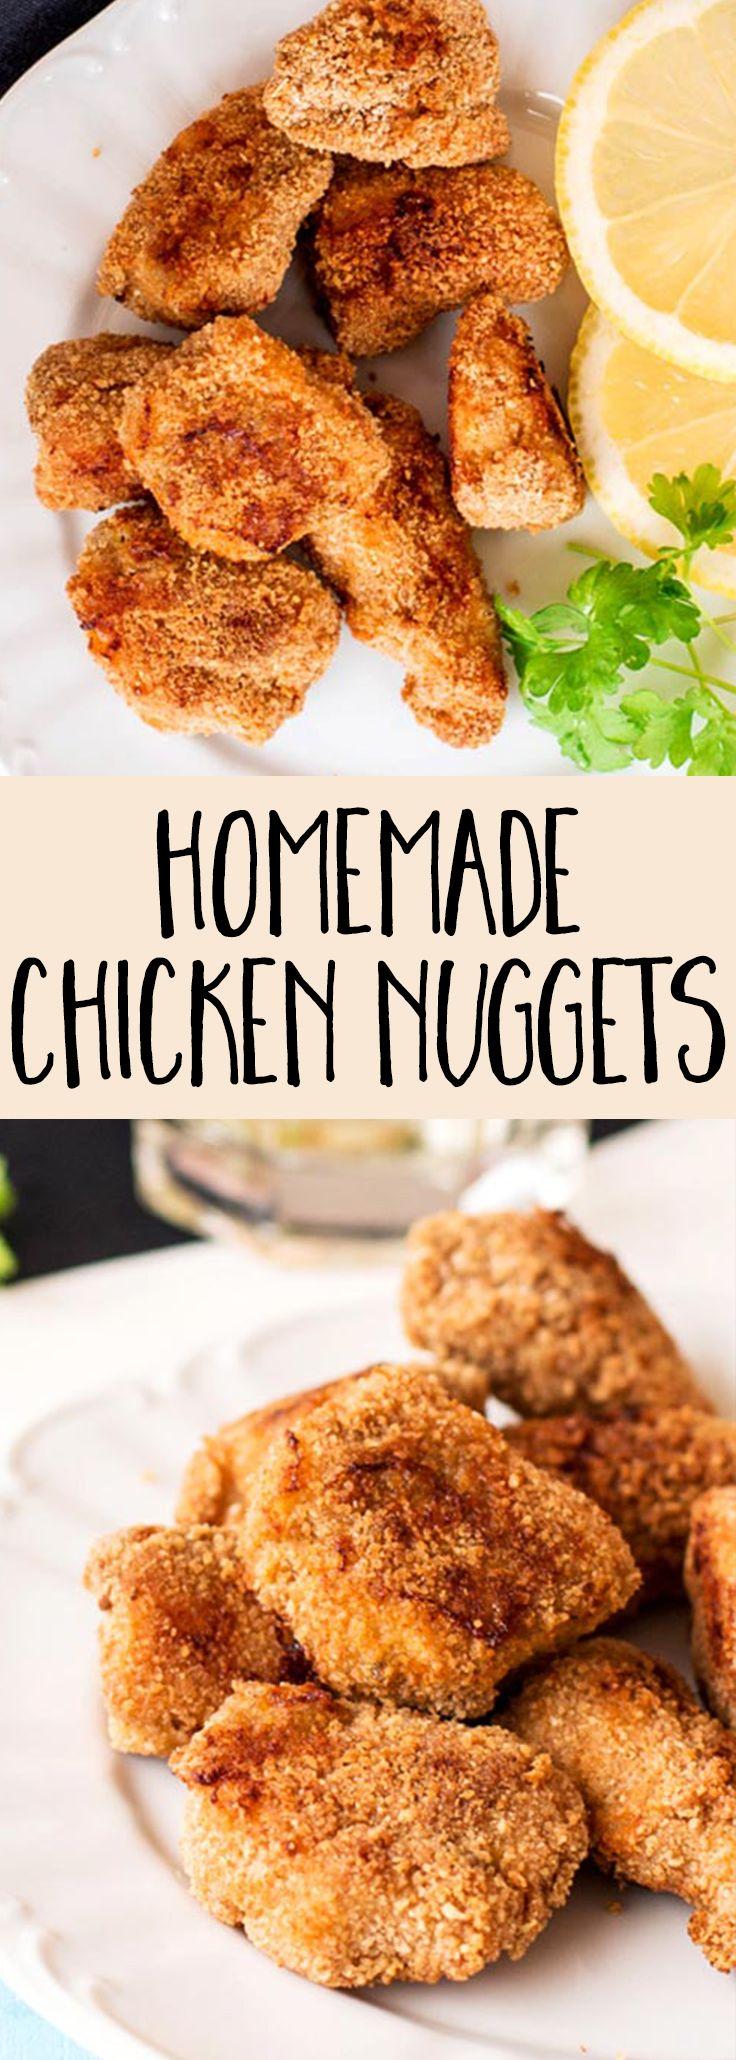 Best 25 Baked Chicken Nuggets Ideas On Pinterest Healthy Chicken Nuggets Breaded Chicken Recipes And Panko Breaded Chicken